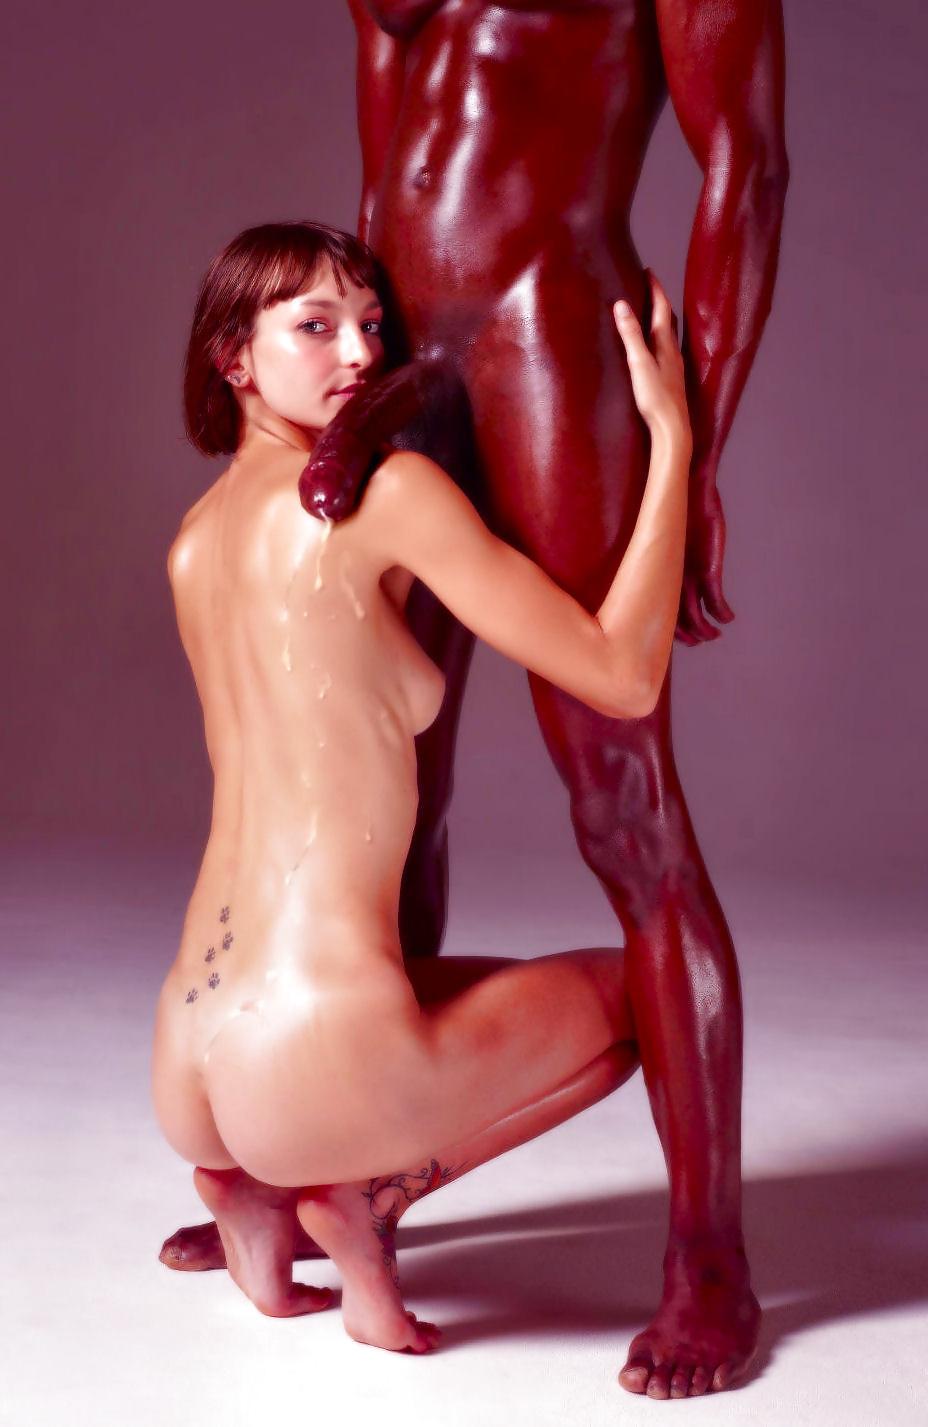 Nude gallery Black gay dick massage